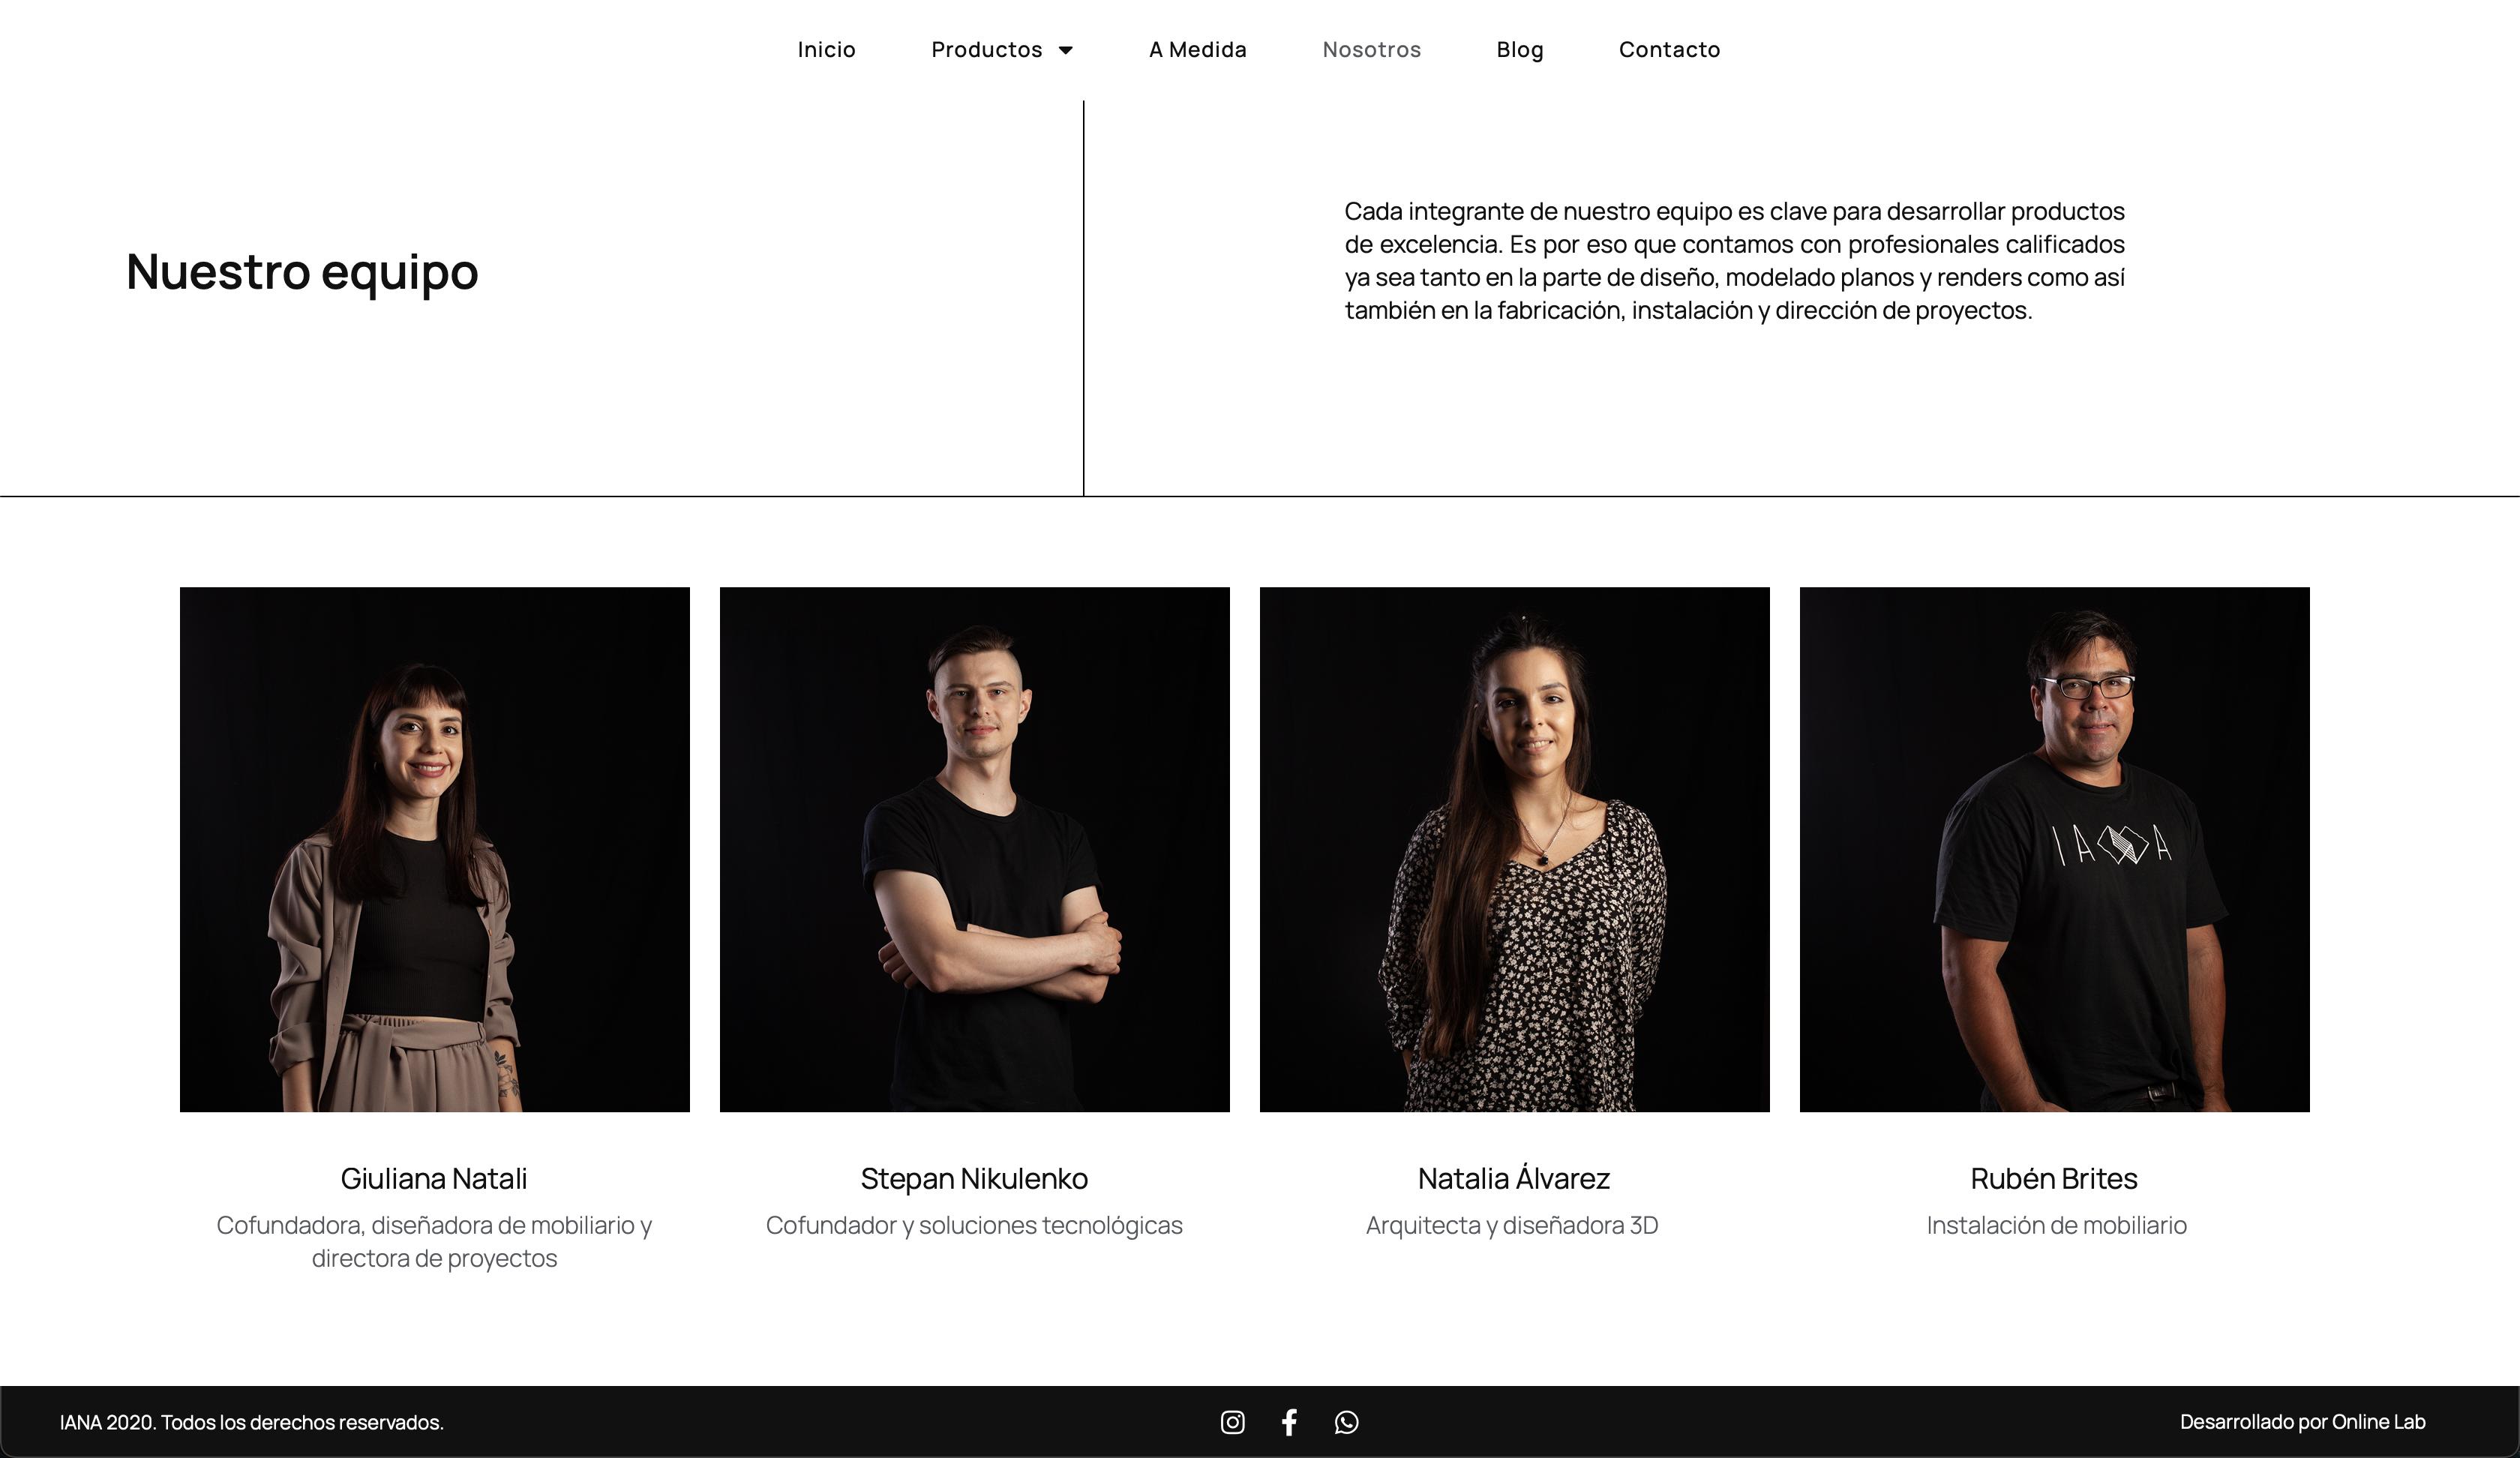 iana-muebles-online-lab-web-development-web-design-8